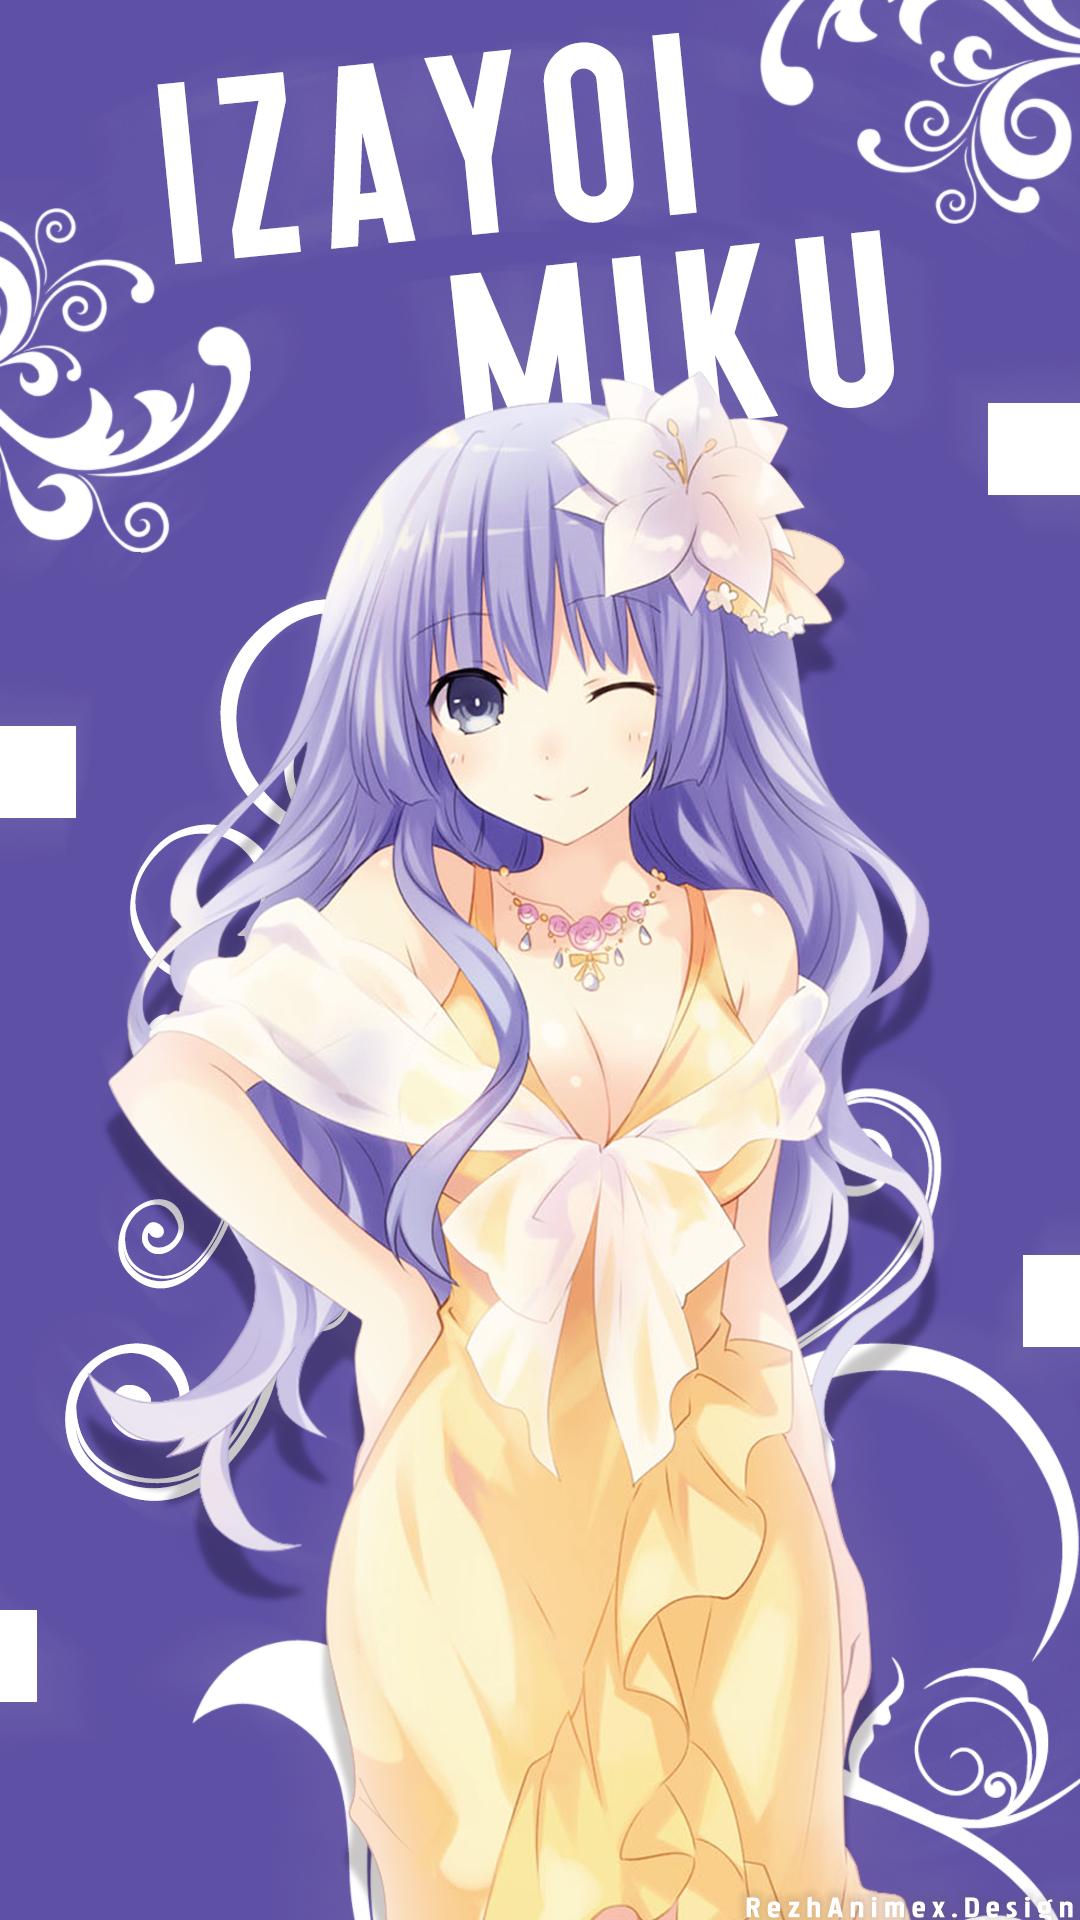 Izayoi Miku Wallpaper Android Ilustrasi Karakter Gadis Animasi Gambar Karakter